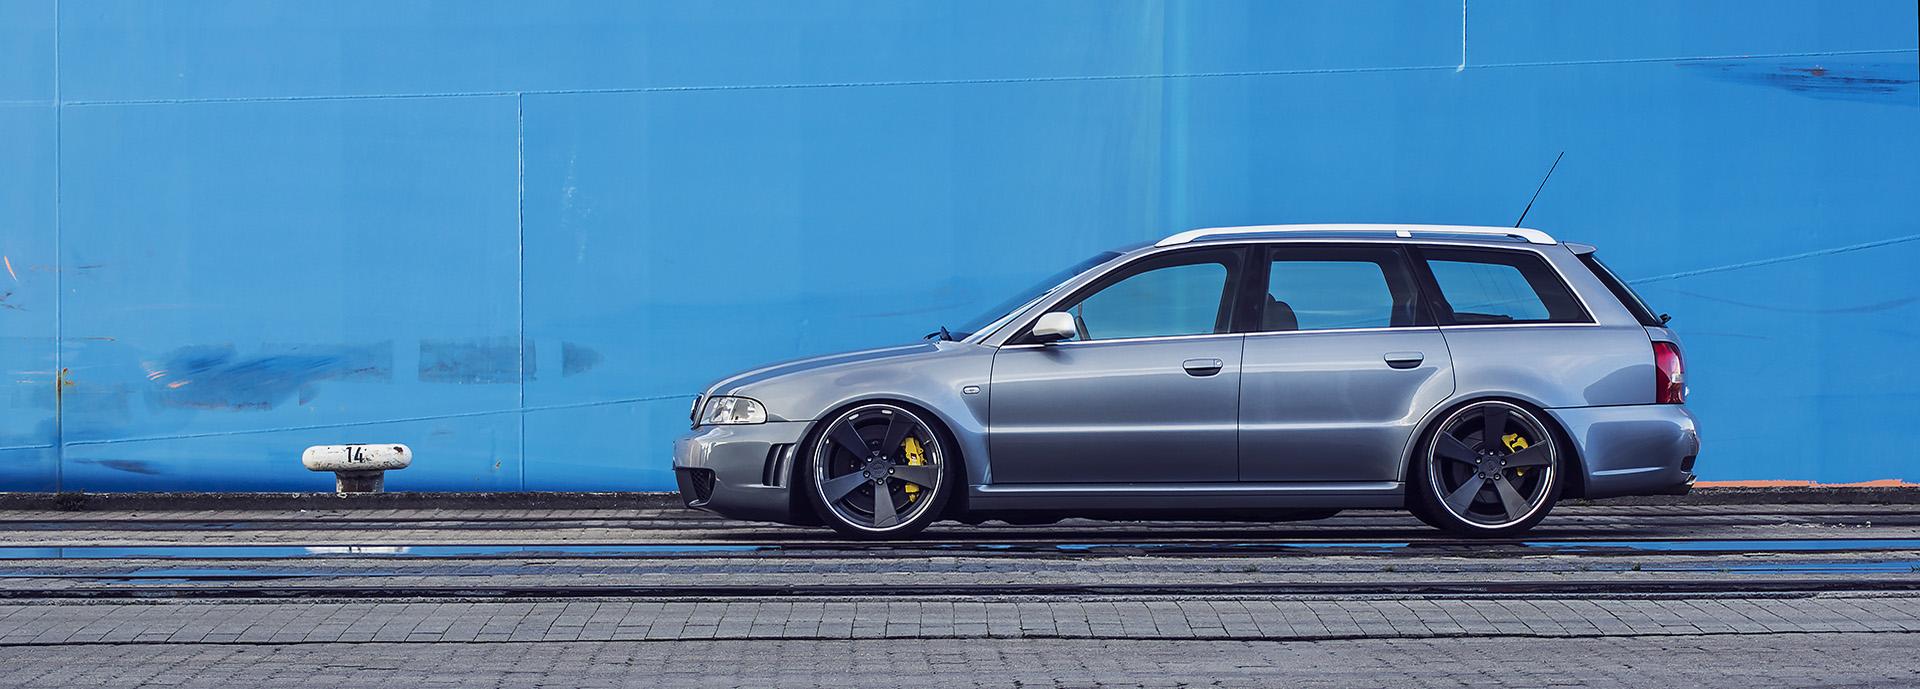 Automotive Tuner